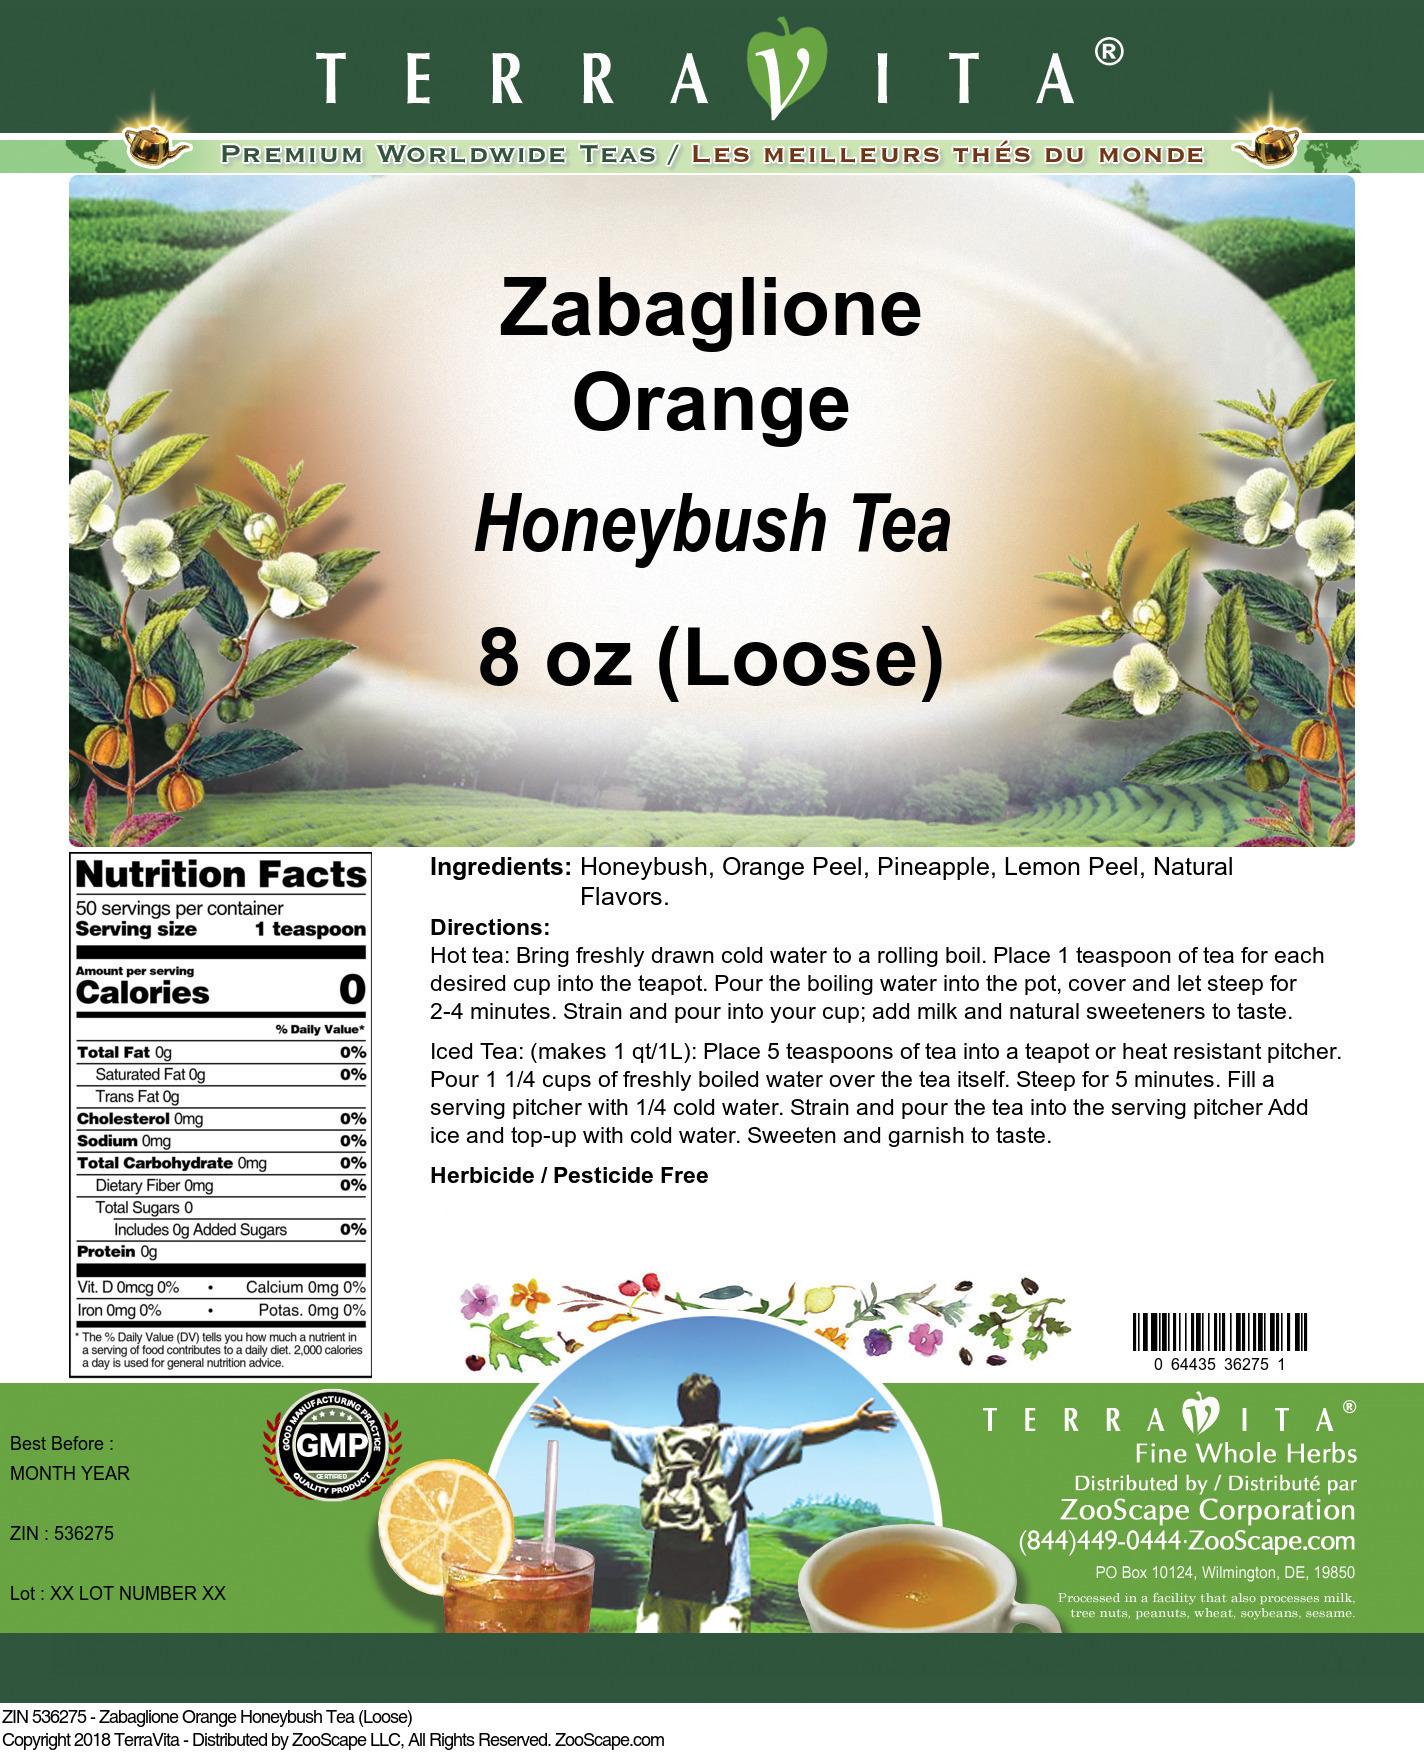 Zabaglione Orange Honeybush Tea (Loose)